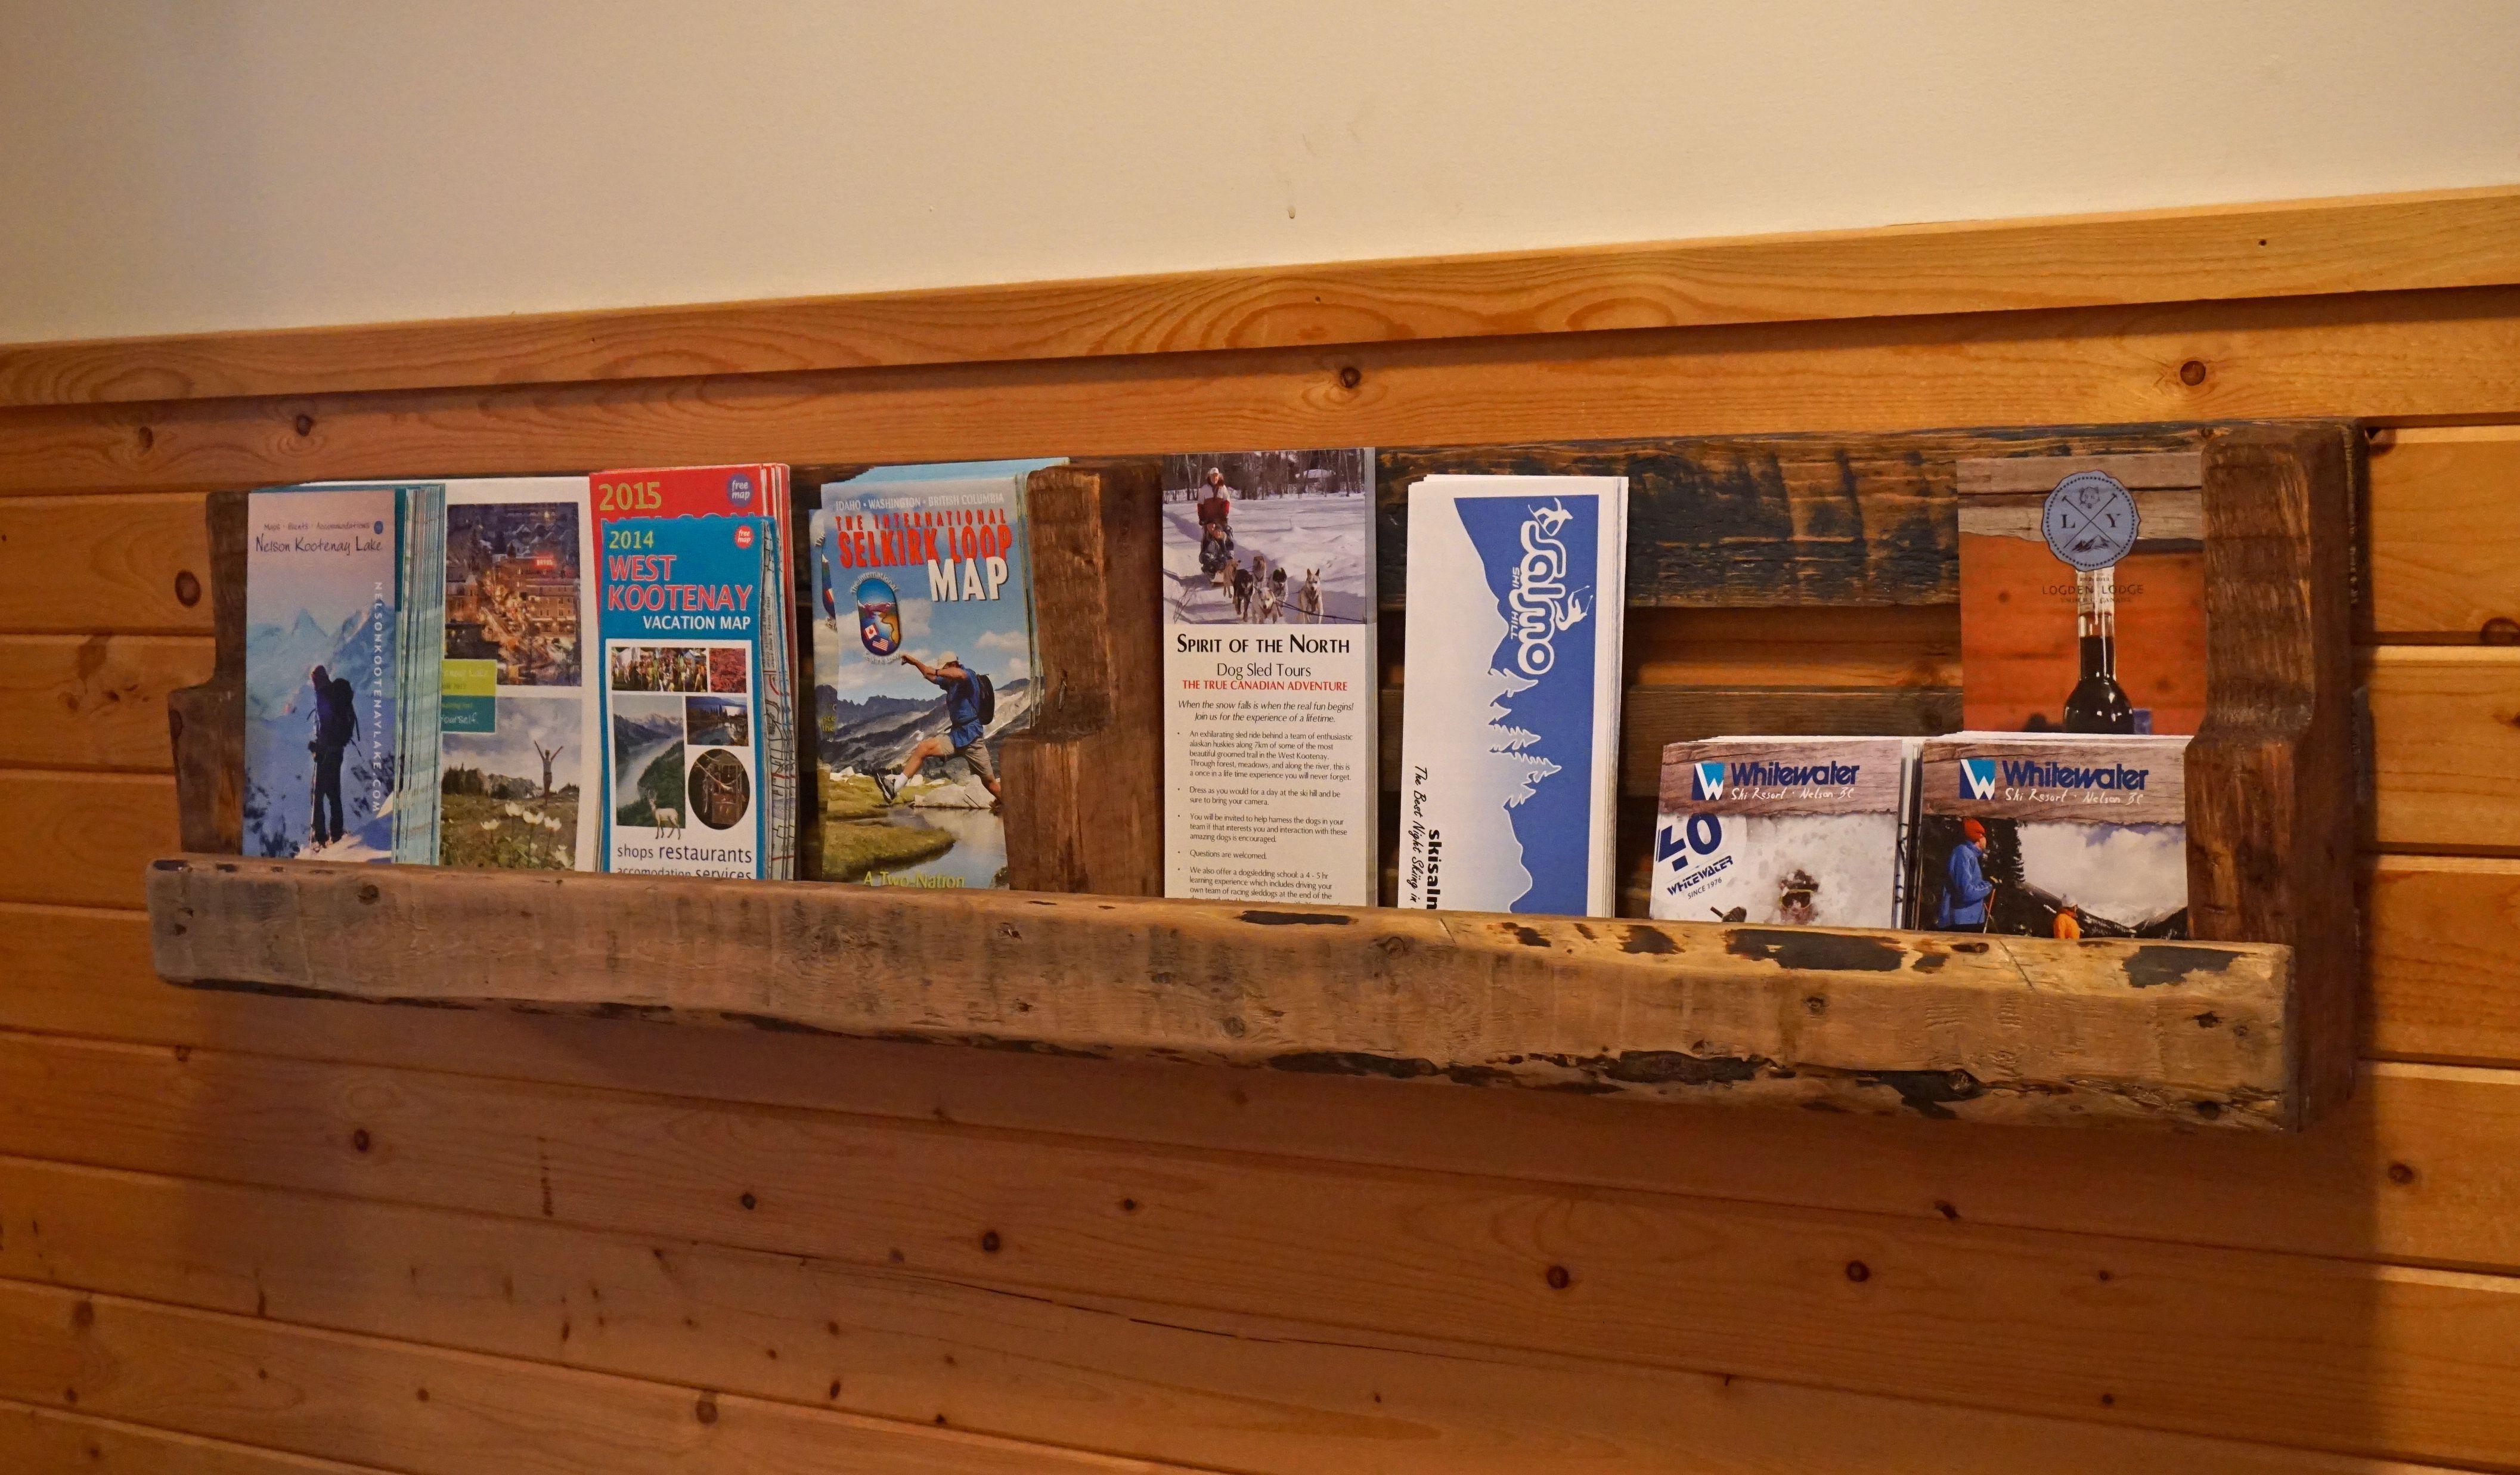 rotating white antique wall kvissle port stand uk newspaper wooden ikea desk holder mount magazine decorationrotating decoration pe pamphlet hanger mounted full brochure rack s